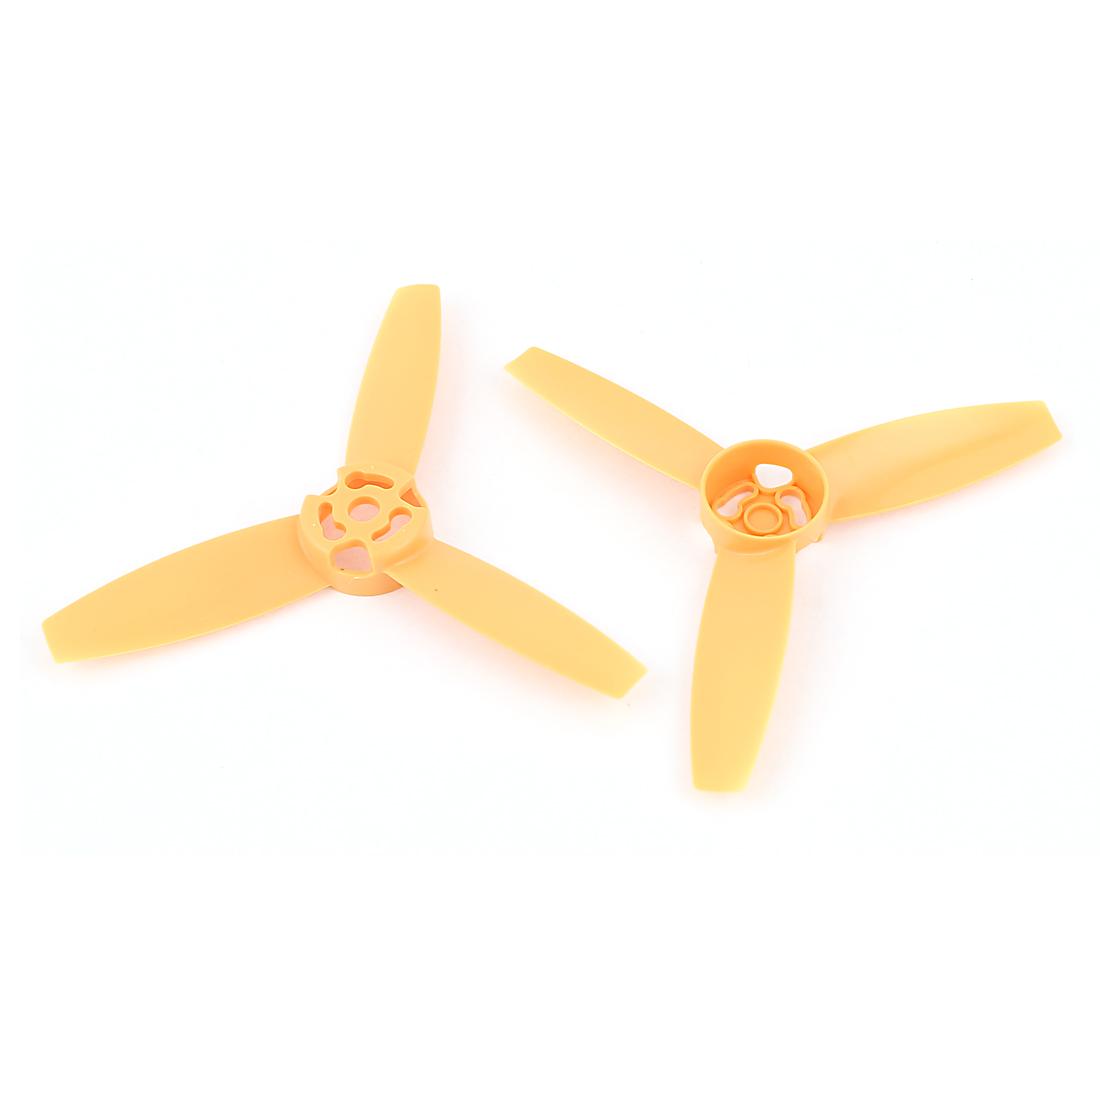 2Pcs 3-Vane 6.5mm Shaft Dia Yellow Prop Propeller for RC Model Aircraft